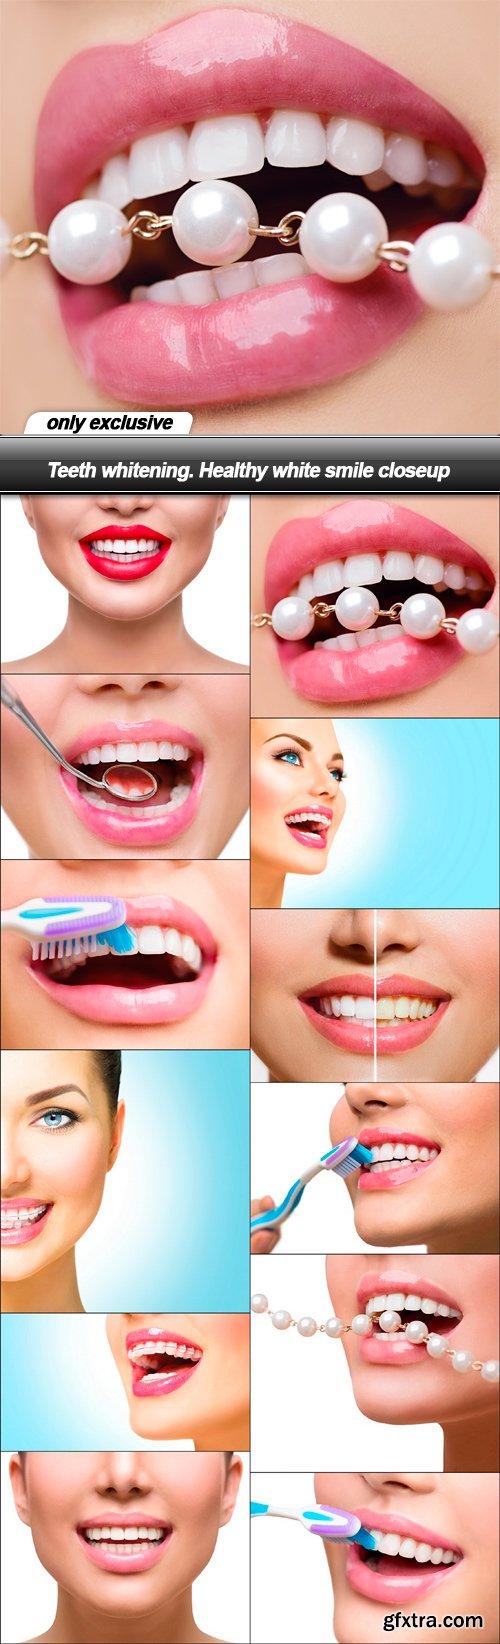 Teeth whitening. Healthy white smile closeup - 12 UHQ JPEG